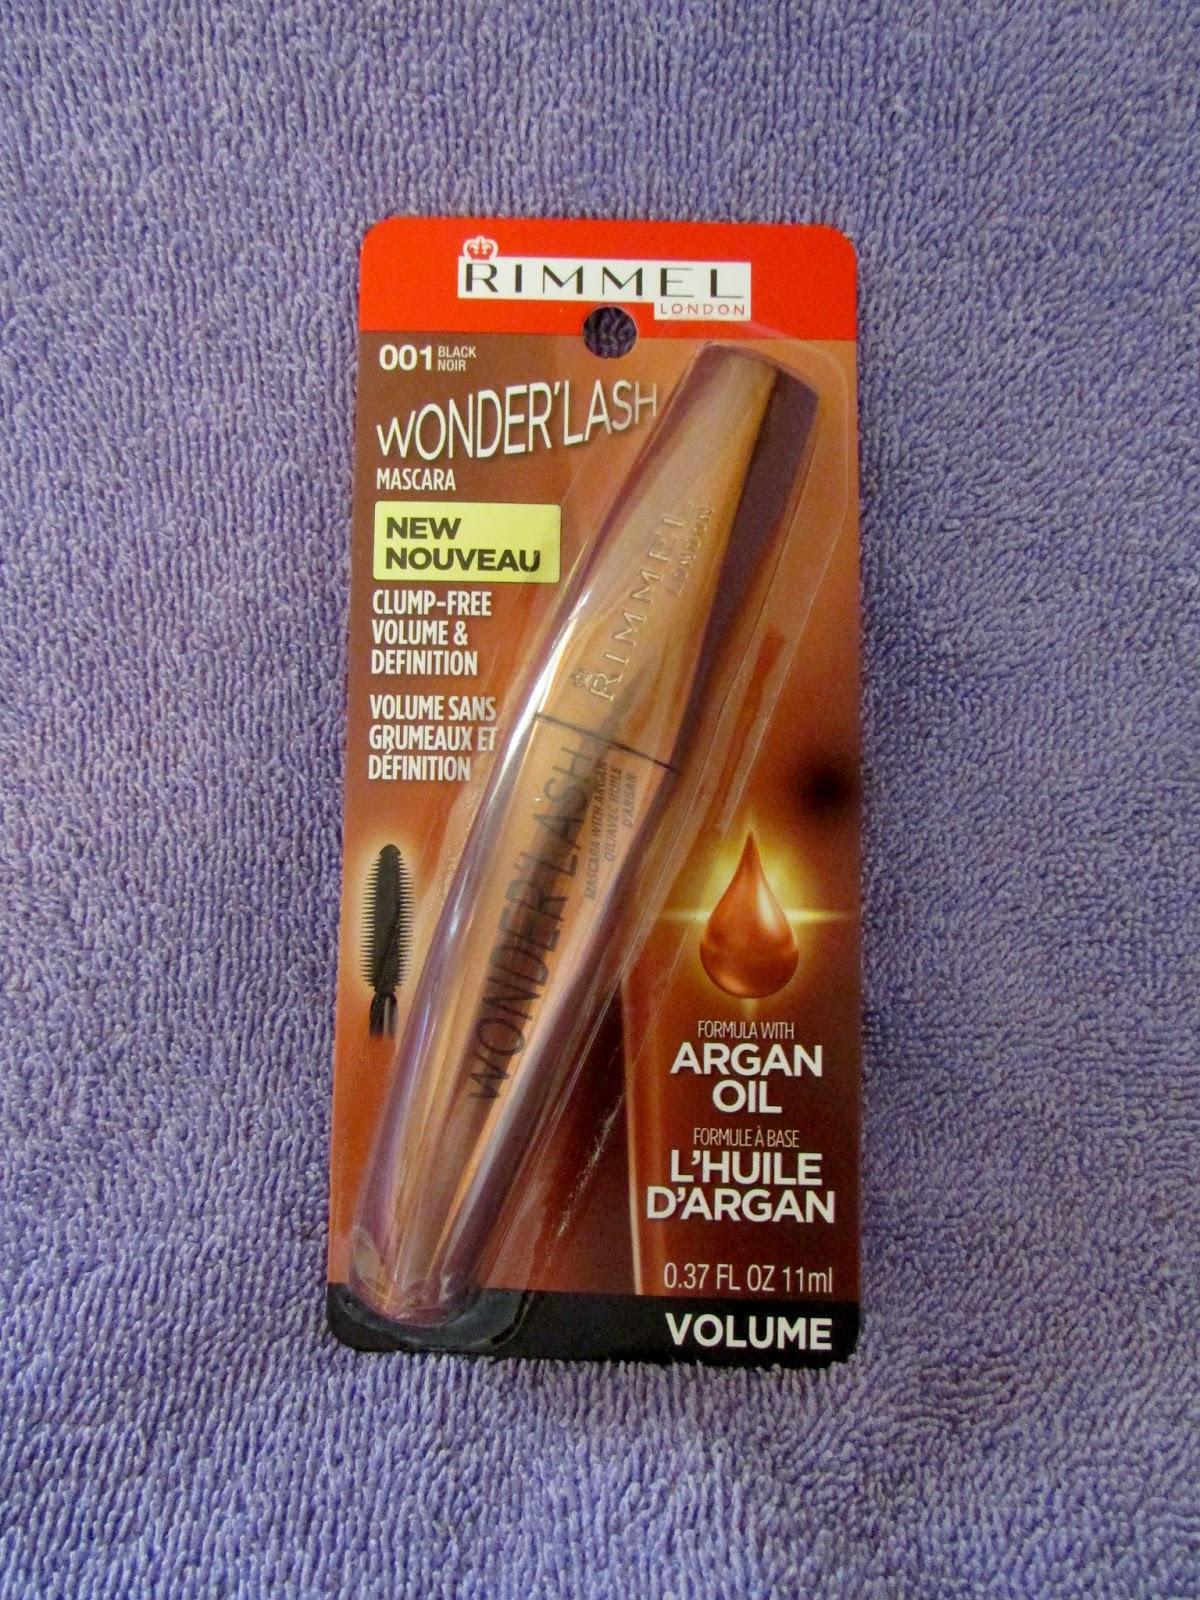 c6c77f2457c Heck Of A Bunch: Rimmel London Wonder'lash Mascara with Argan Oil ...